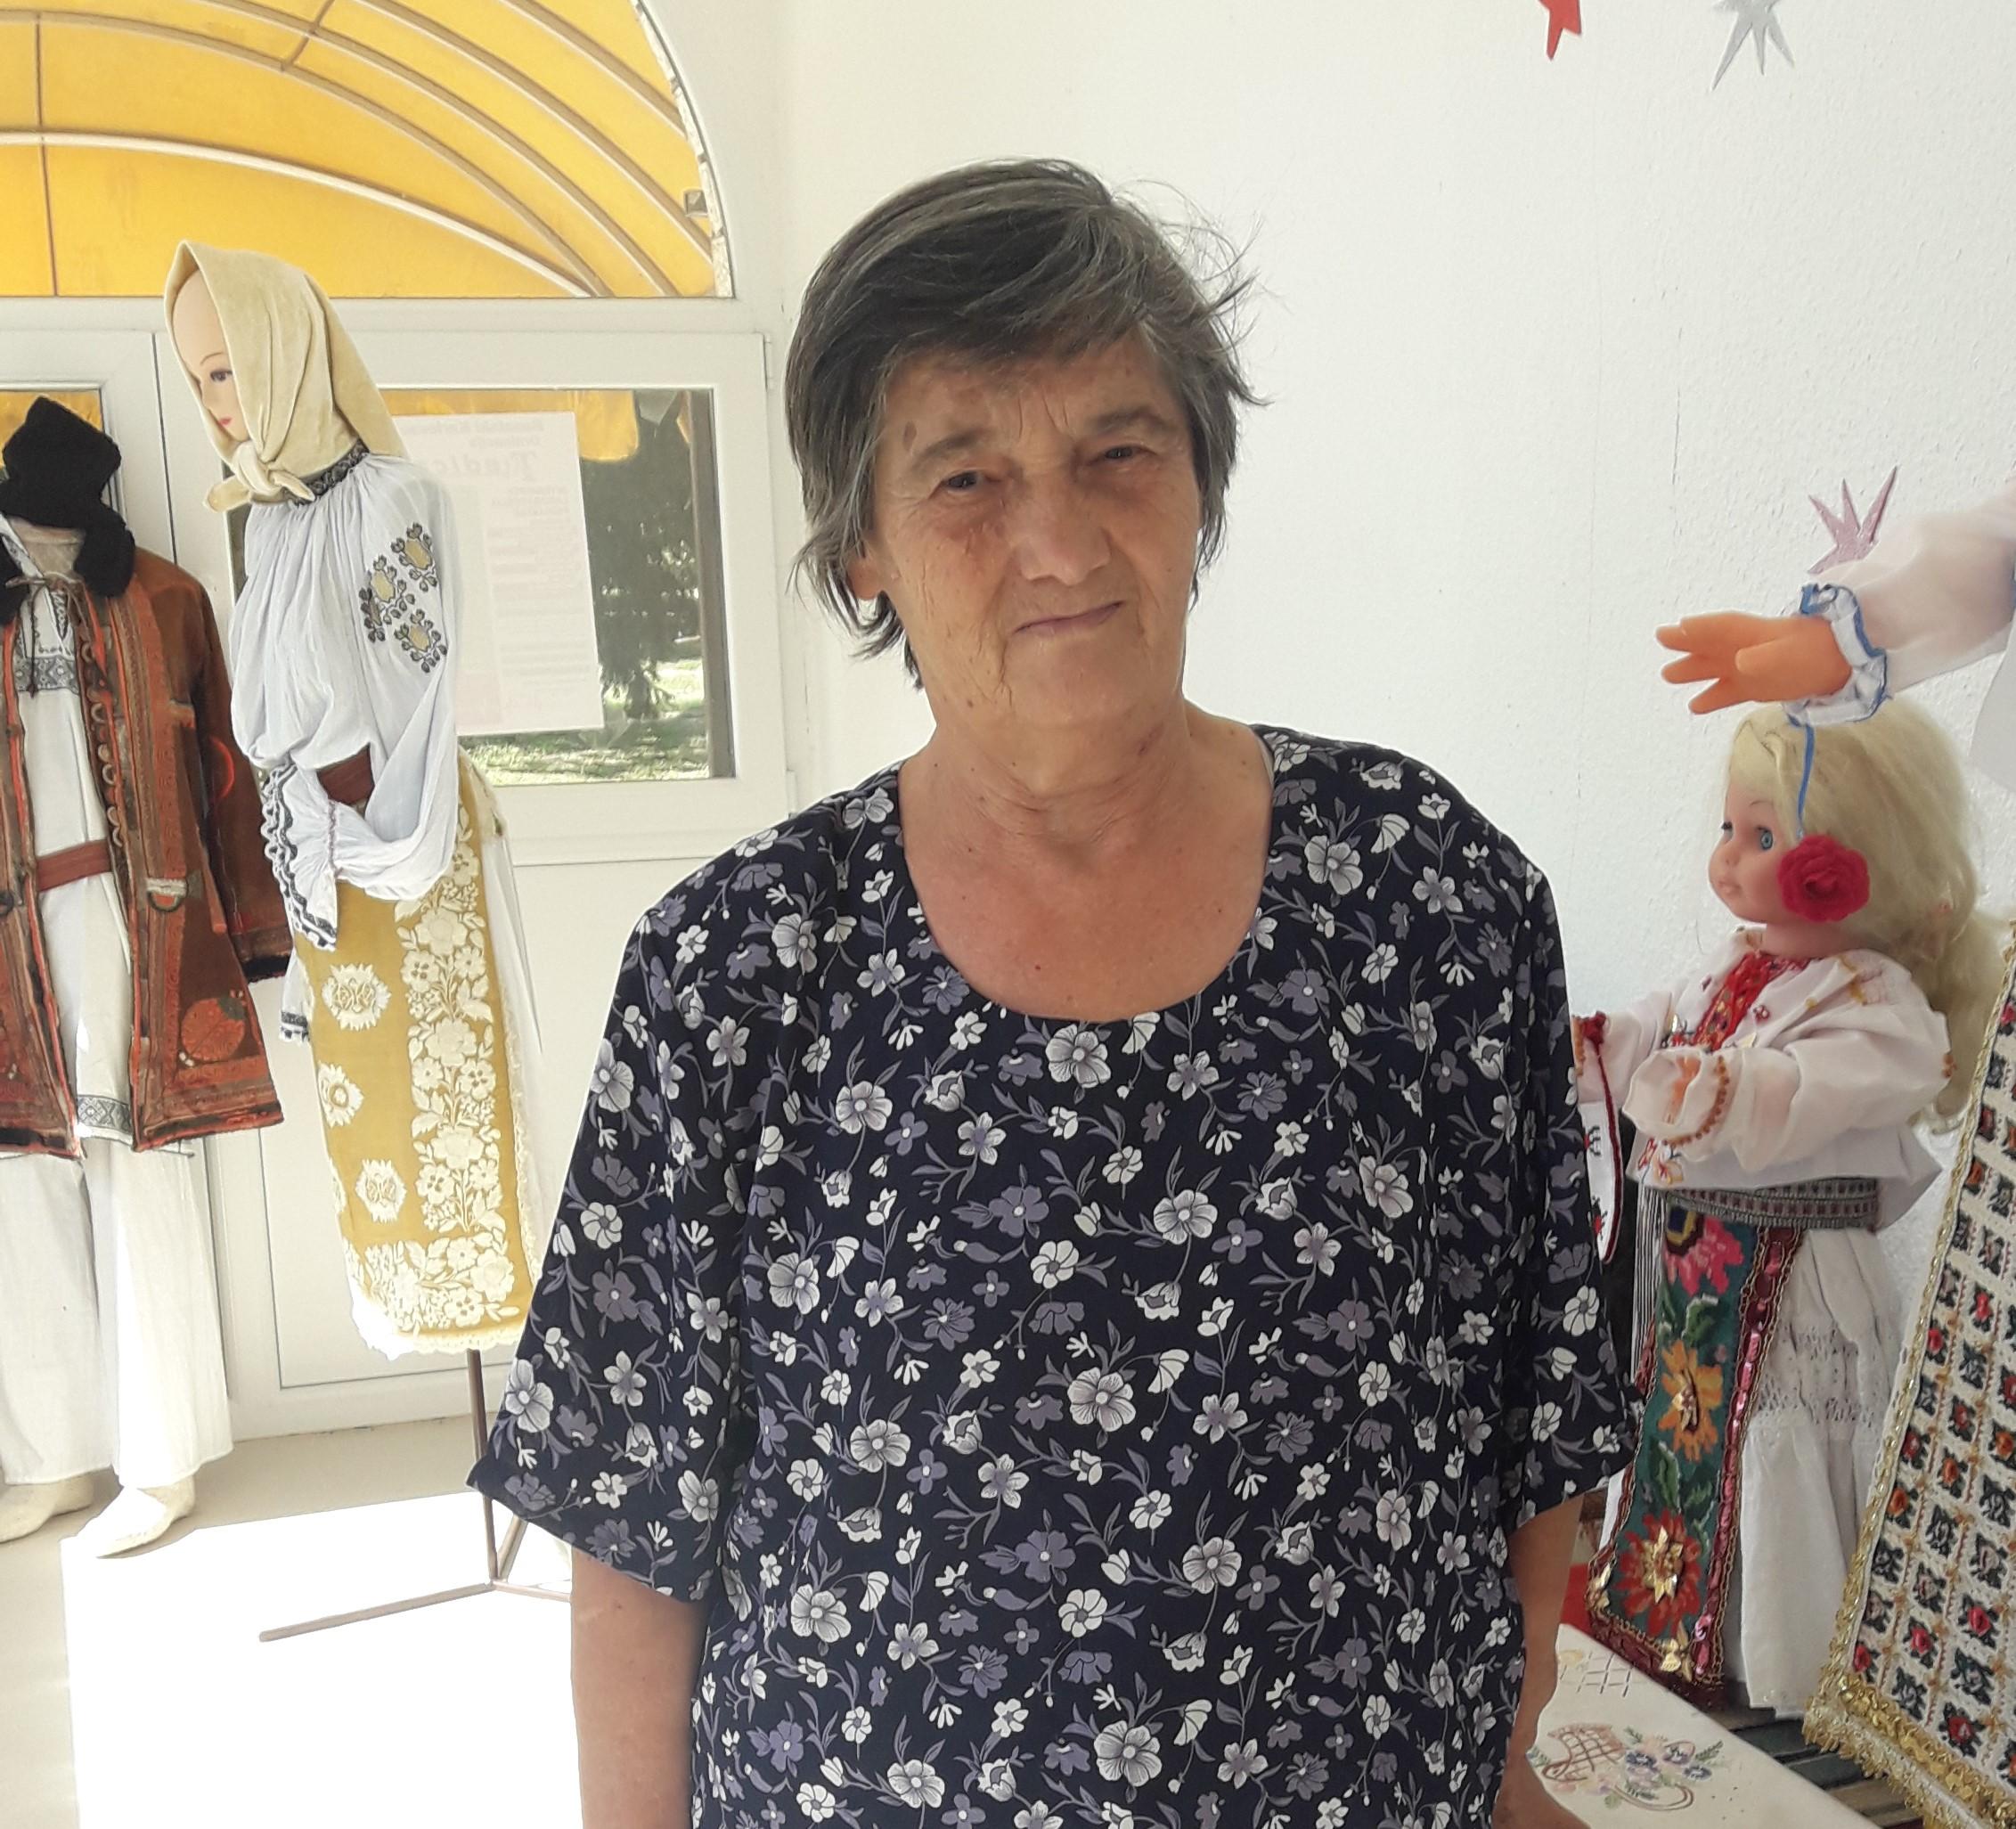 "MARIA RUJAN, PREȘEDINTA ASOCIAȚIEI FEMEILOR ,,ETNO-ART BRAKOS"" DIN ALIBUNAR"